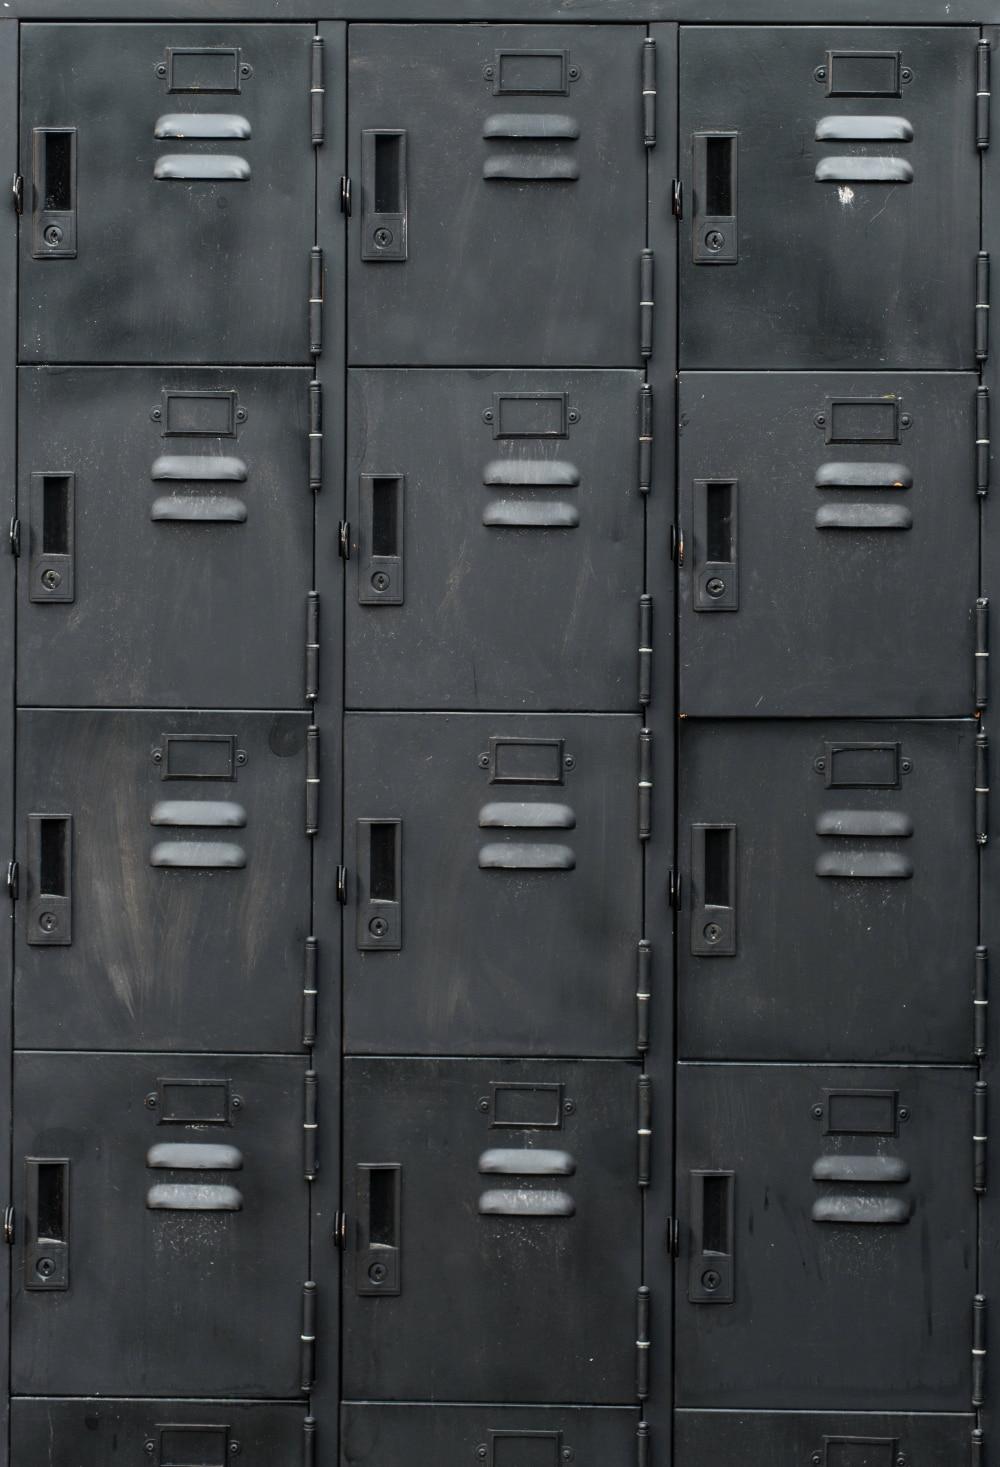 school locker photography studio photo backdrop background backdrop XT-5914